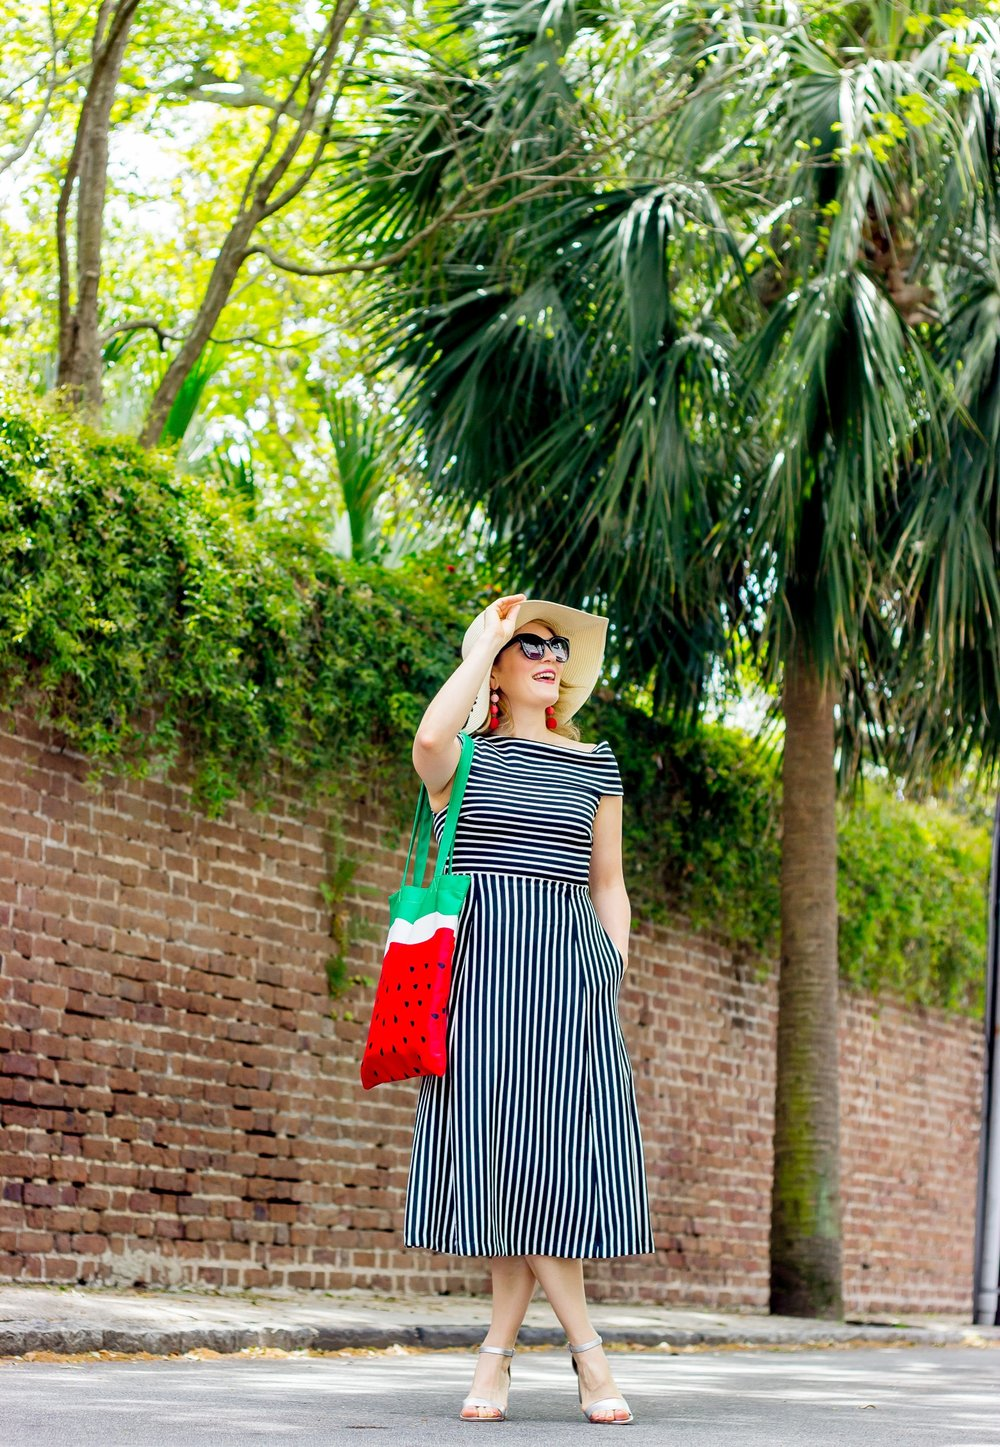 Forever 21 watermelon bag on Belle Meets World blog